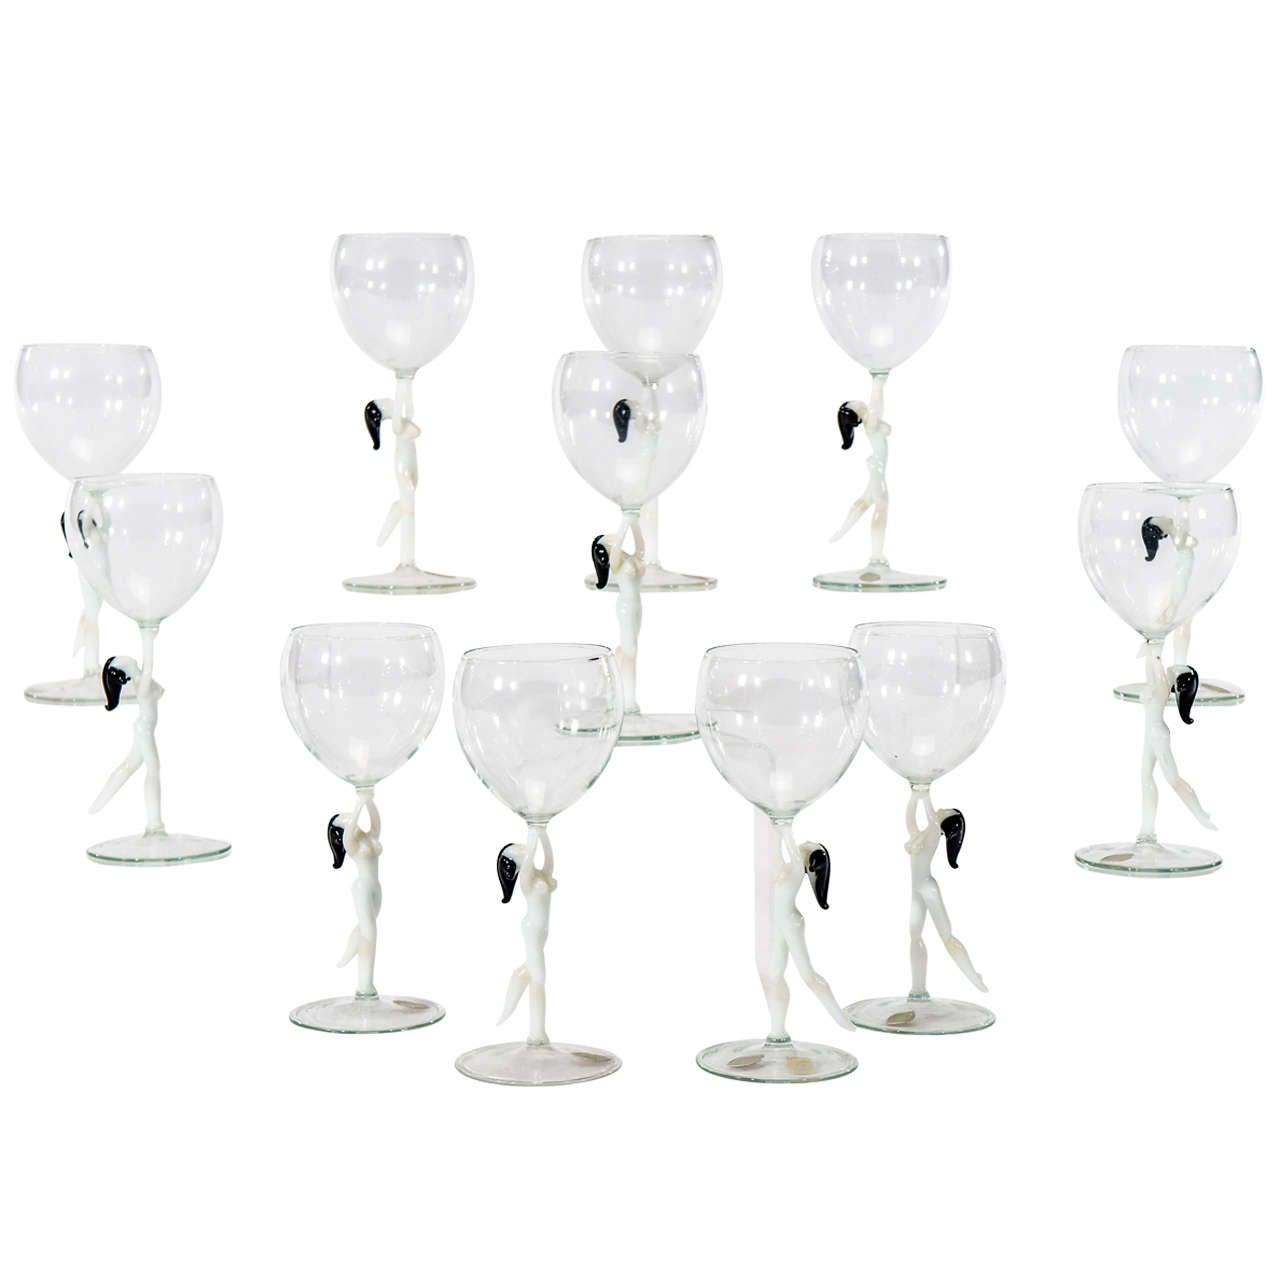 Set of 12 Bimini Lauschaer Nude Stem Goblets W/ Original Labels